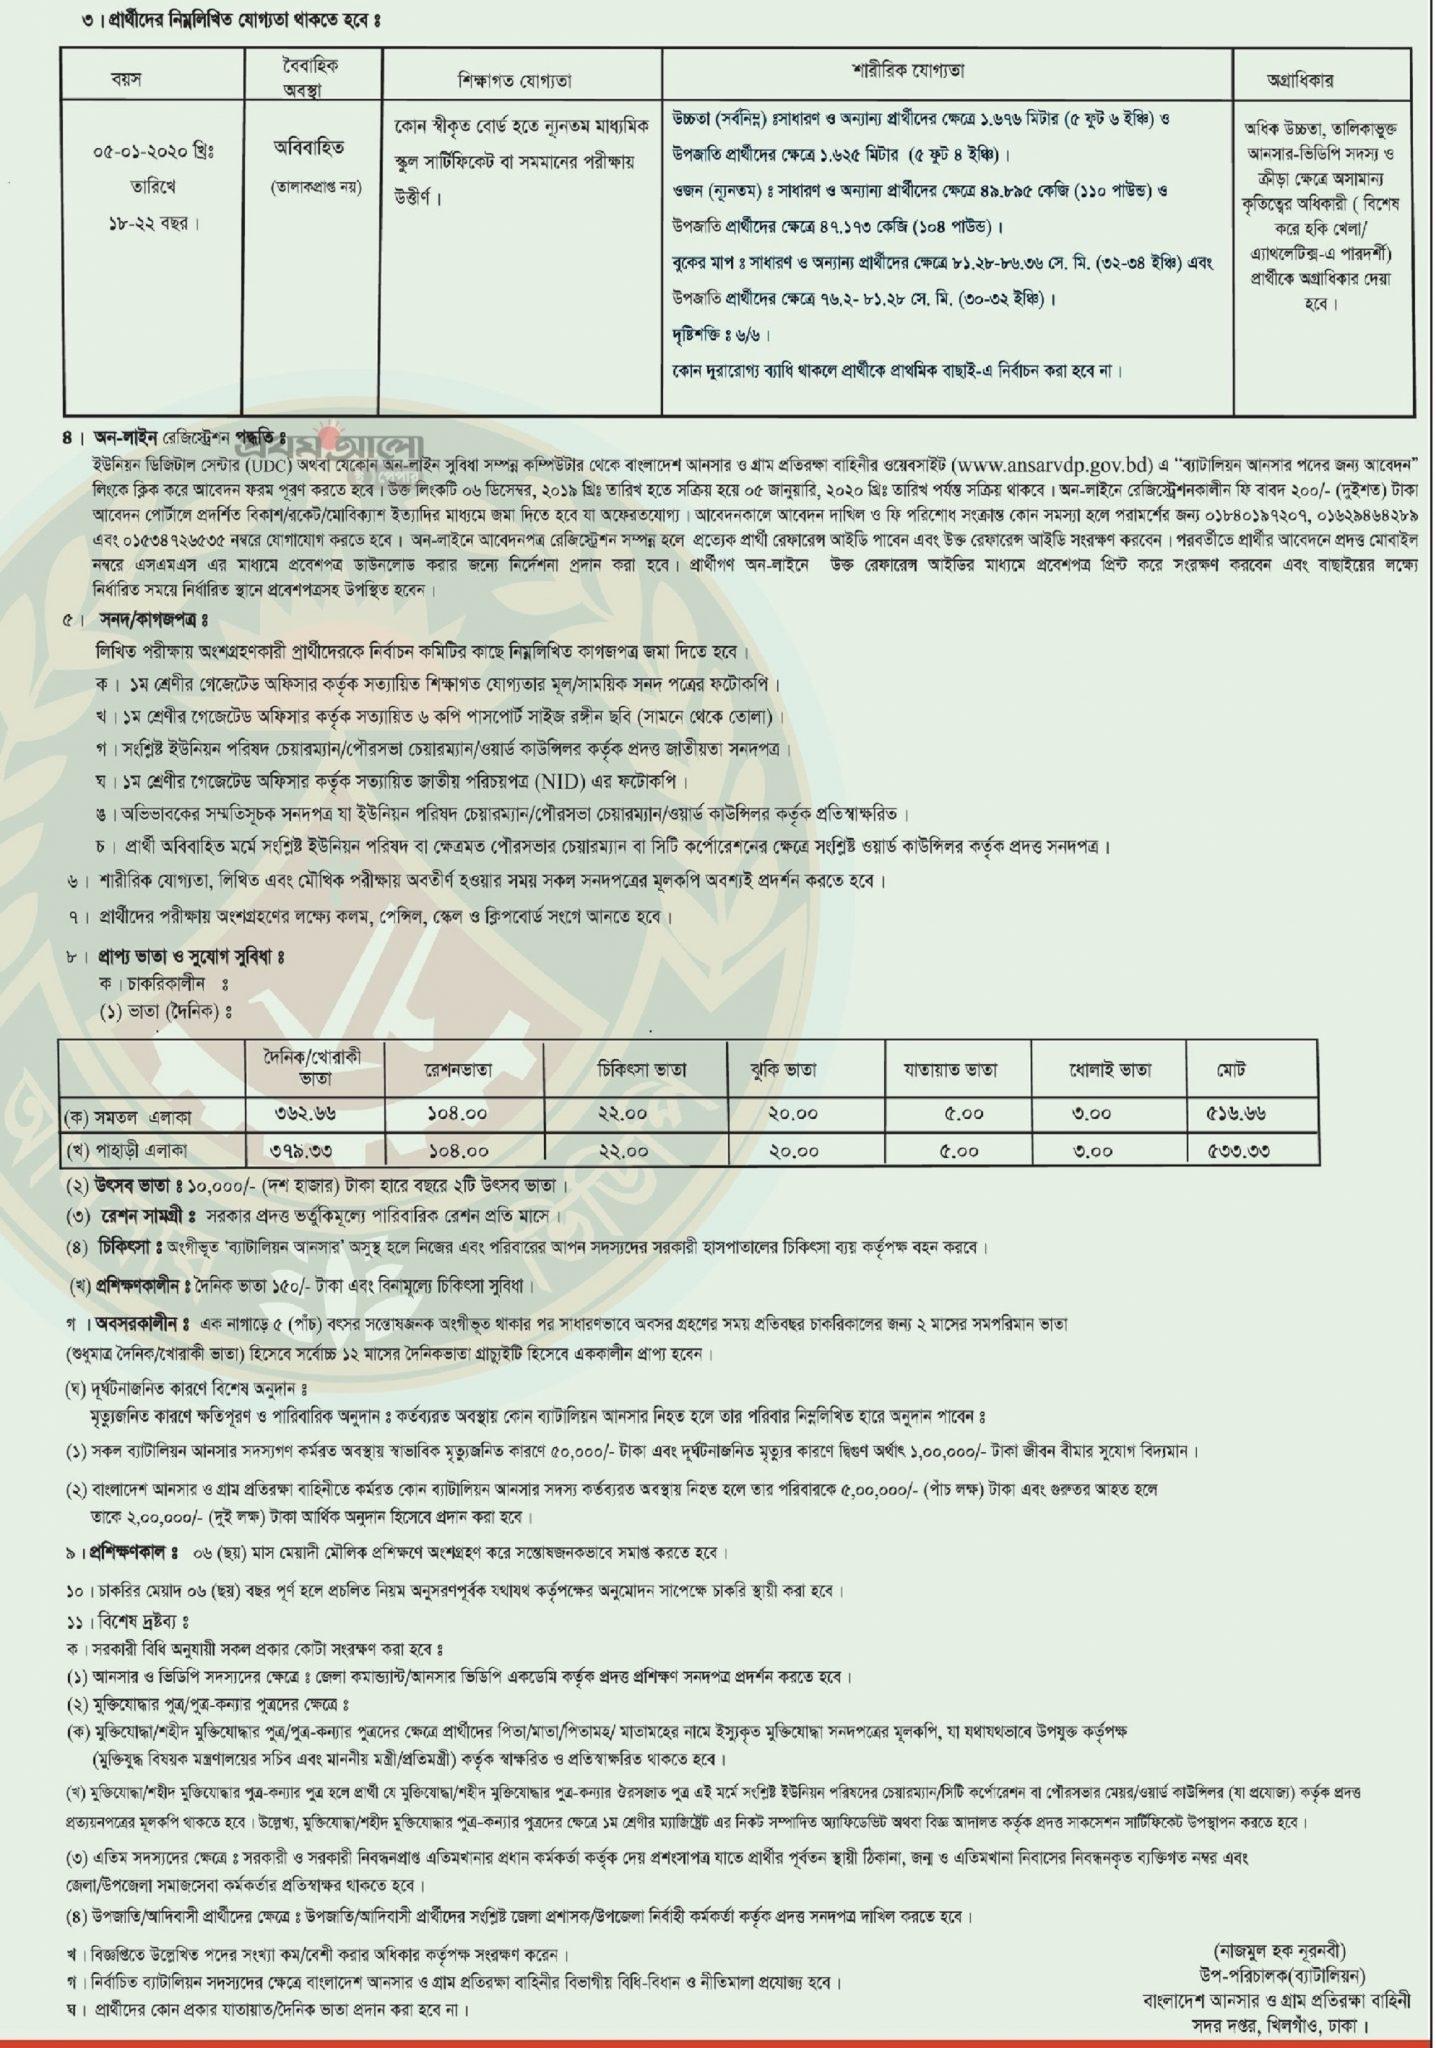 Bangladesh Ansar VDP Job Result